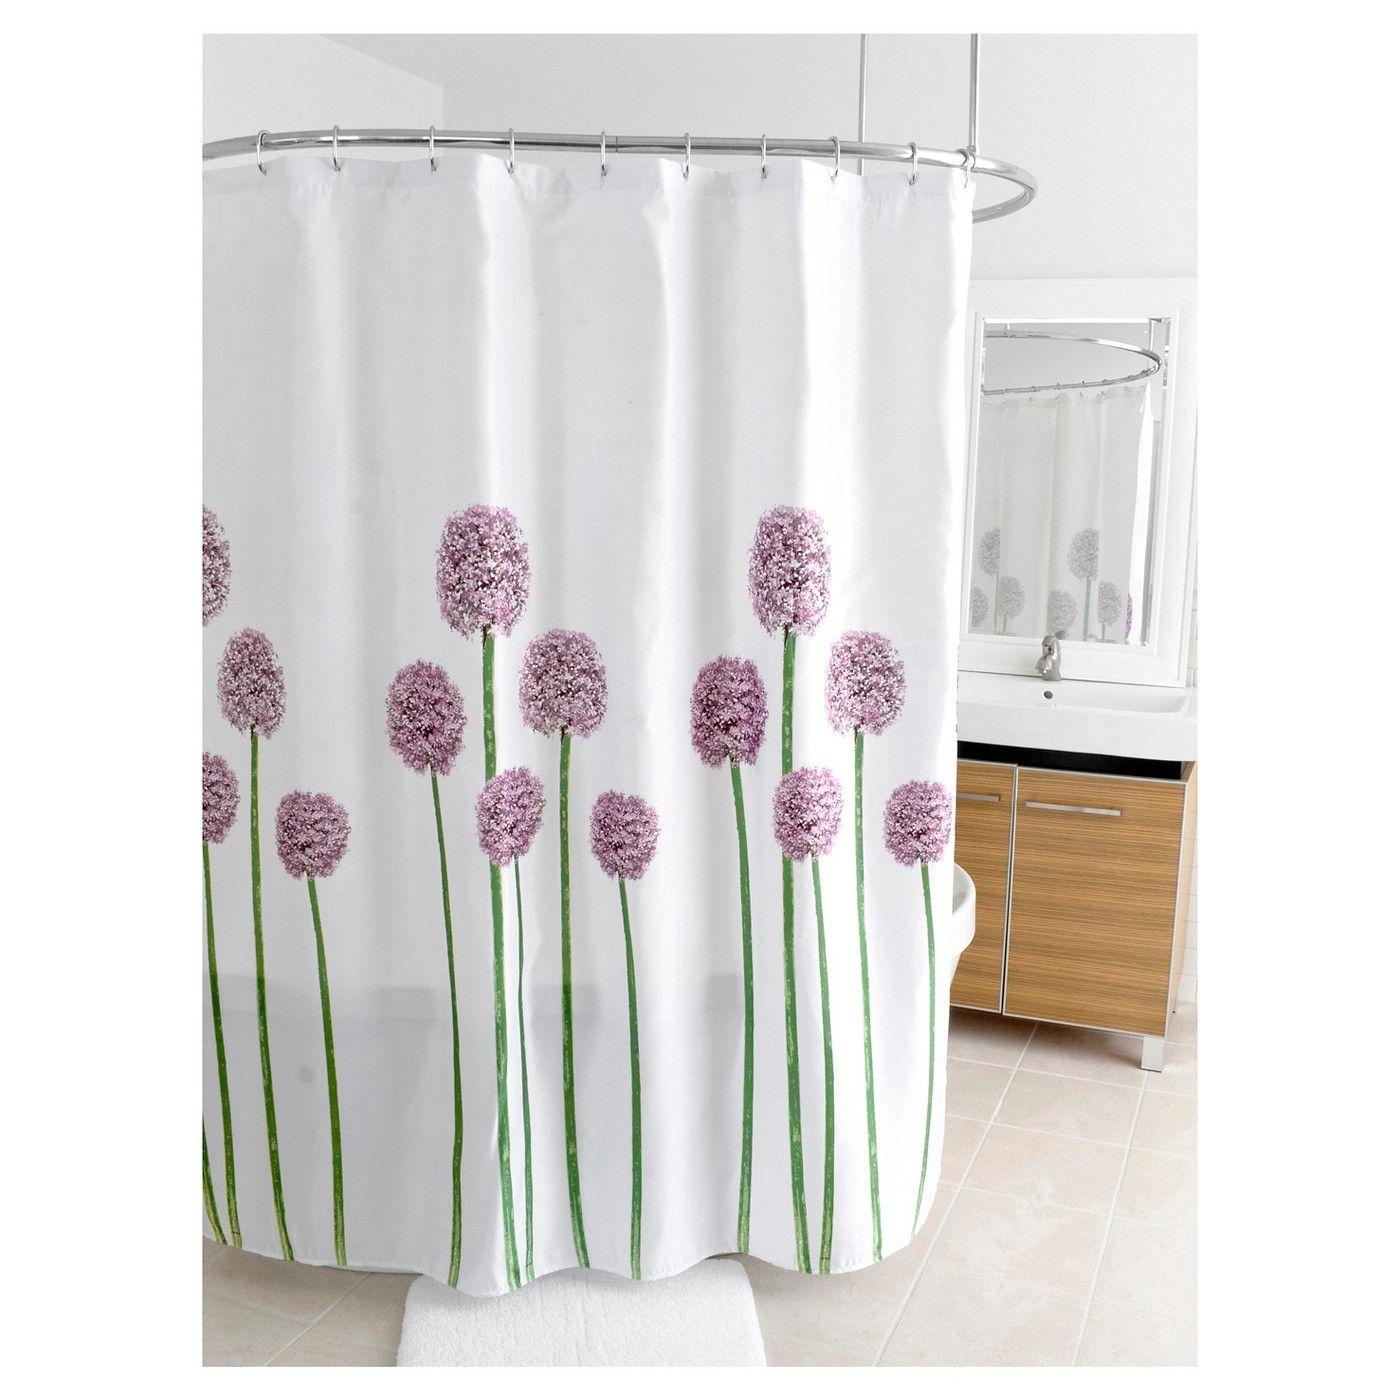 Fabric Floral Shower Curtain - Purple/Green - Splash Home | Floral ...